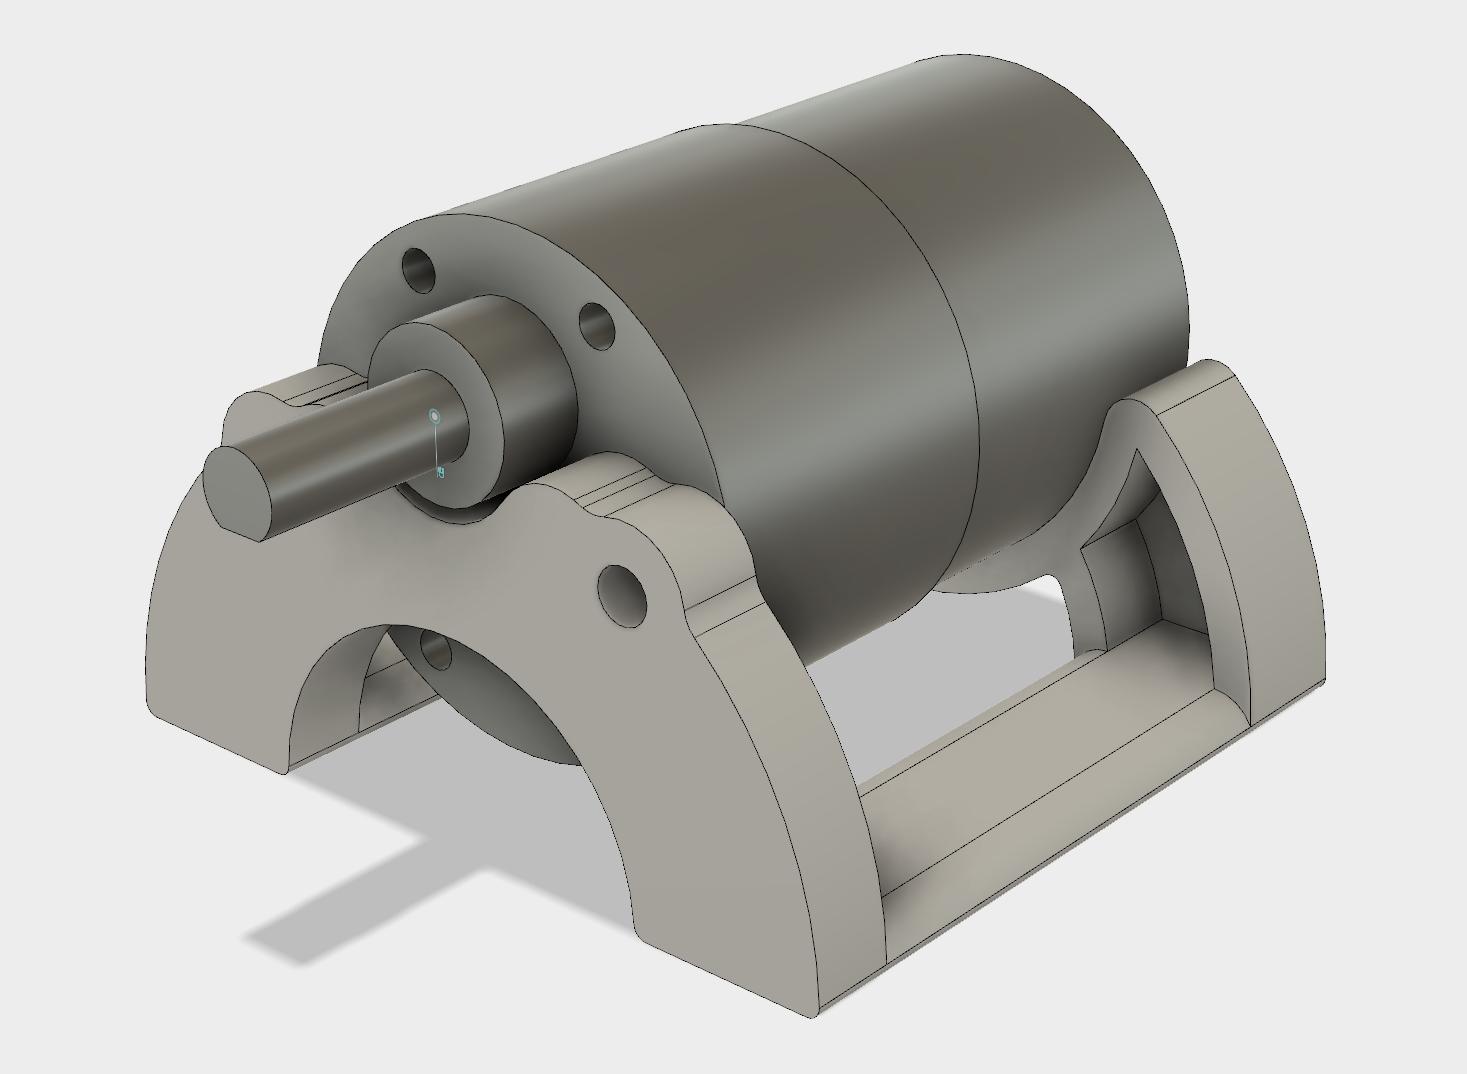 Motor sitting on new curvy base